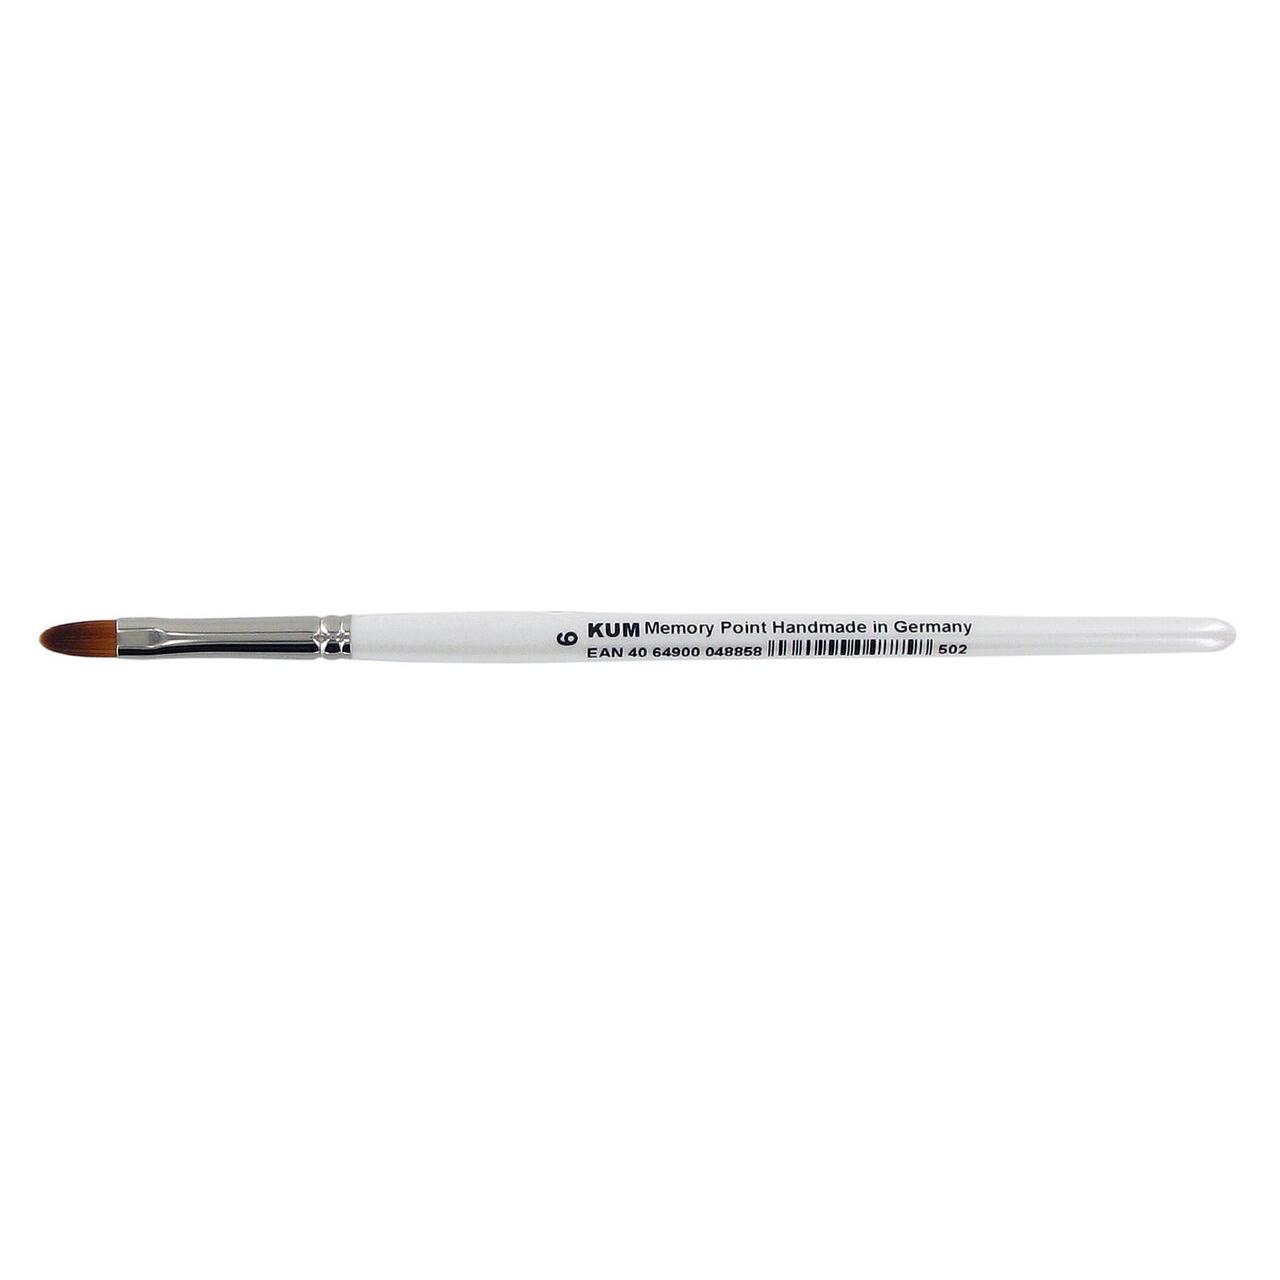 قلم مو کوم مدل 514.00.11